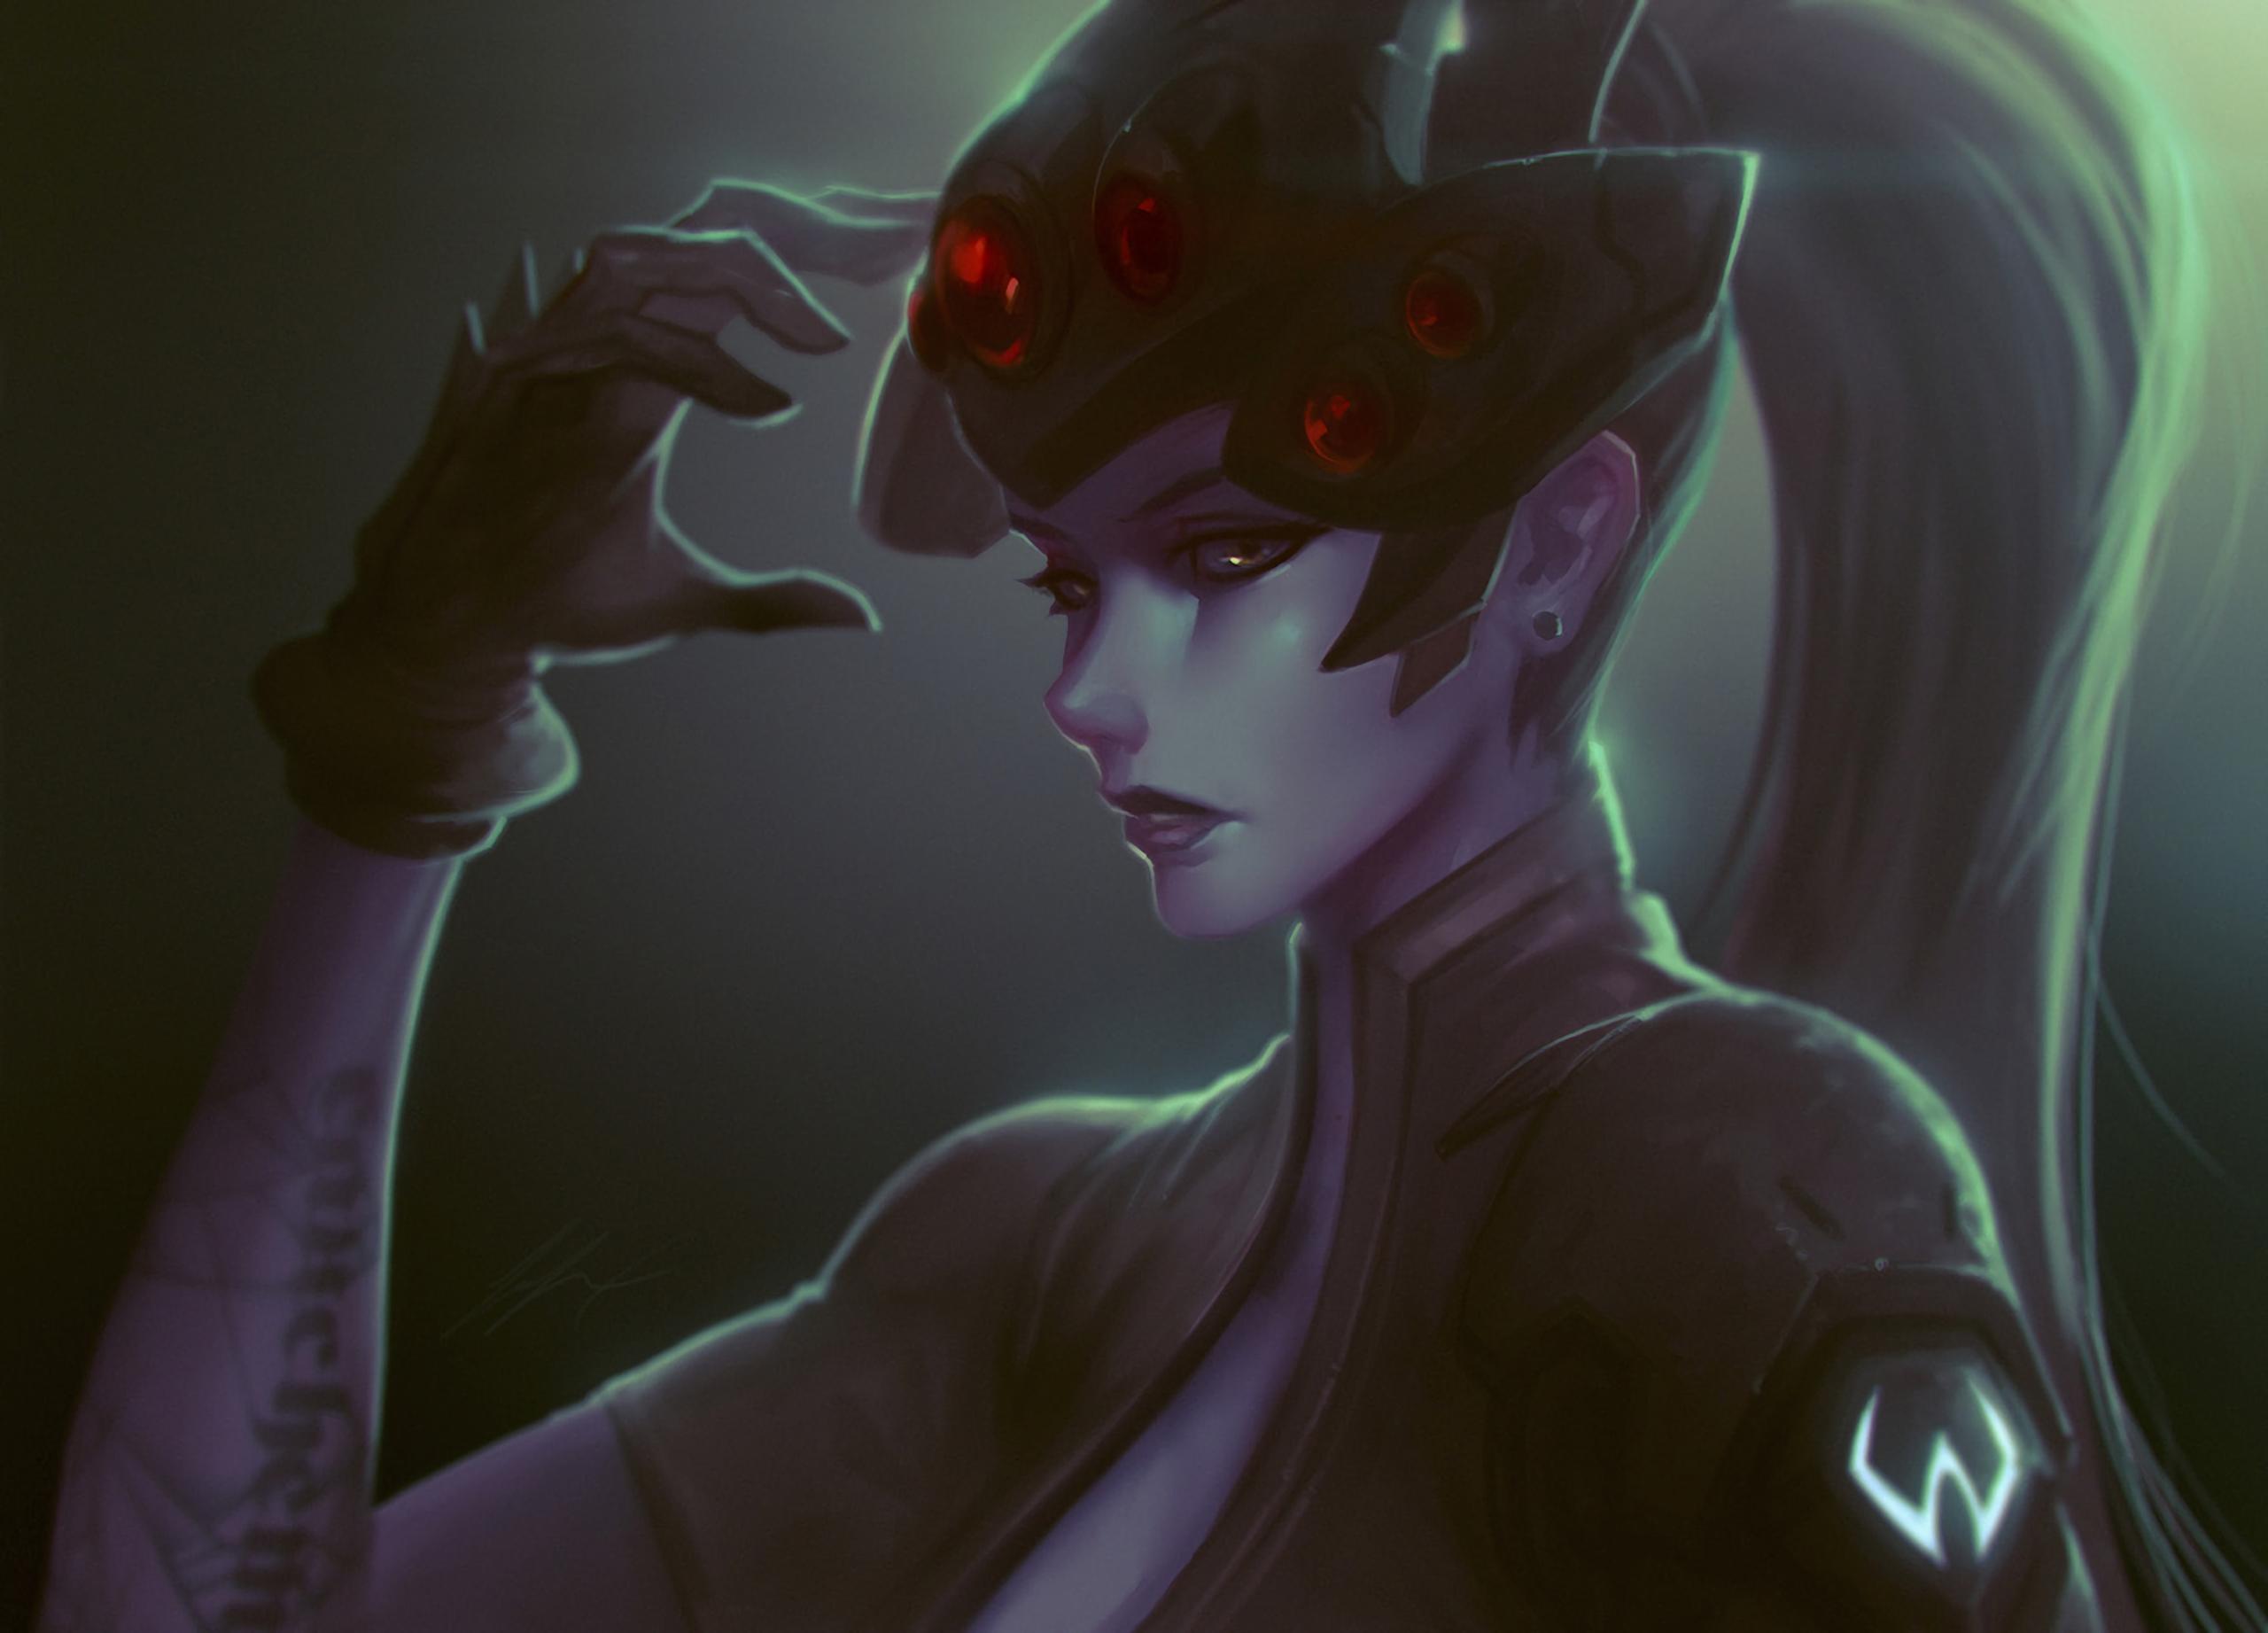 Anime 2560x1843 Overwatch Widowmaker (Overwatch) Amélie Lacroix tattoo visors long hair purple skin video games video game girls yellow eyes ponytail gloves